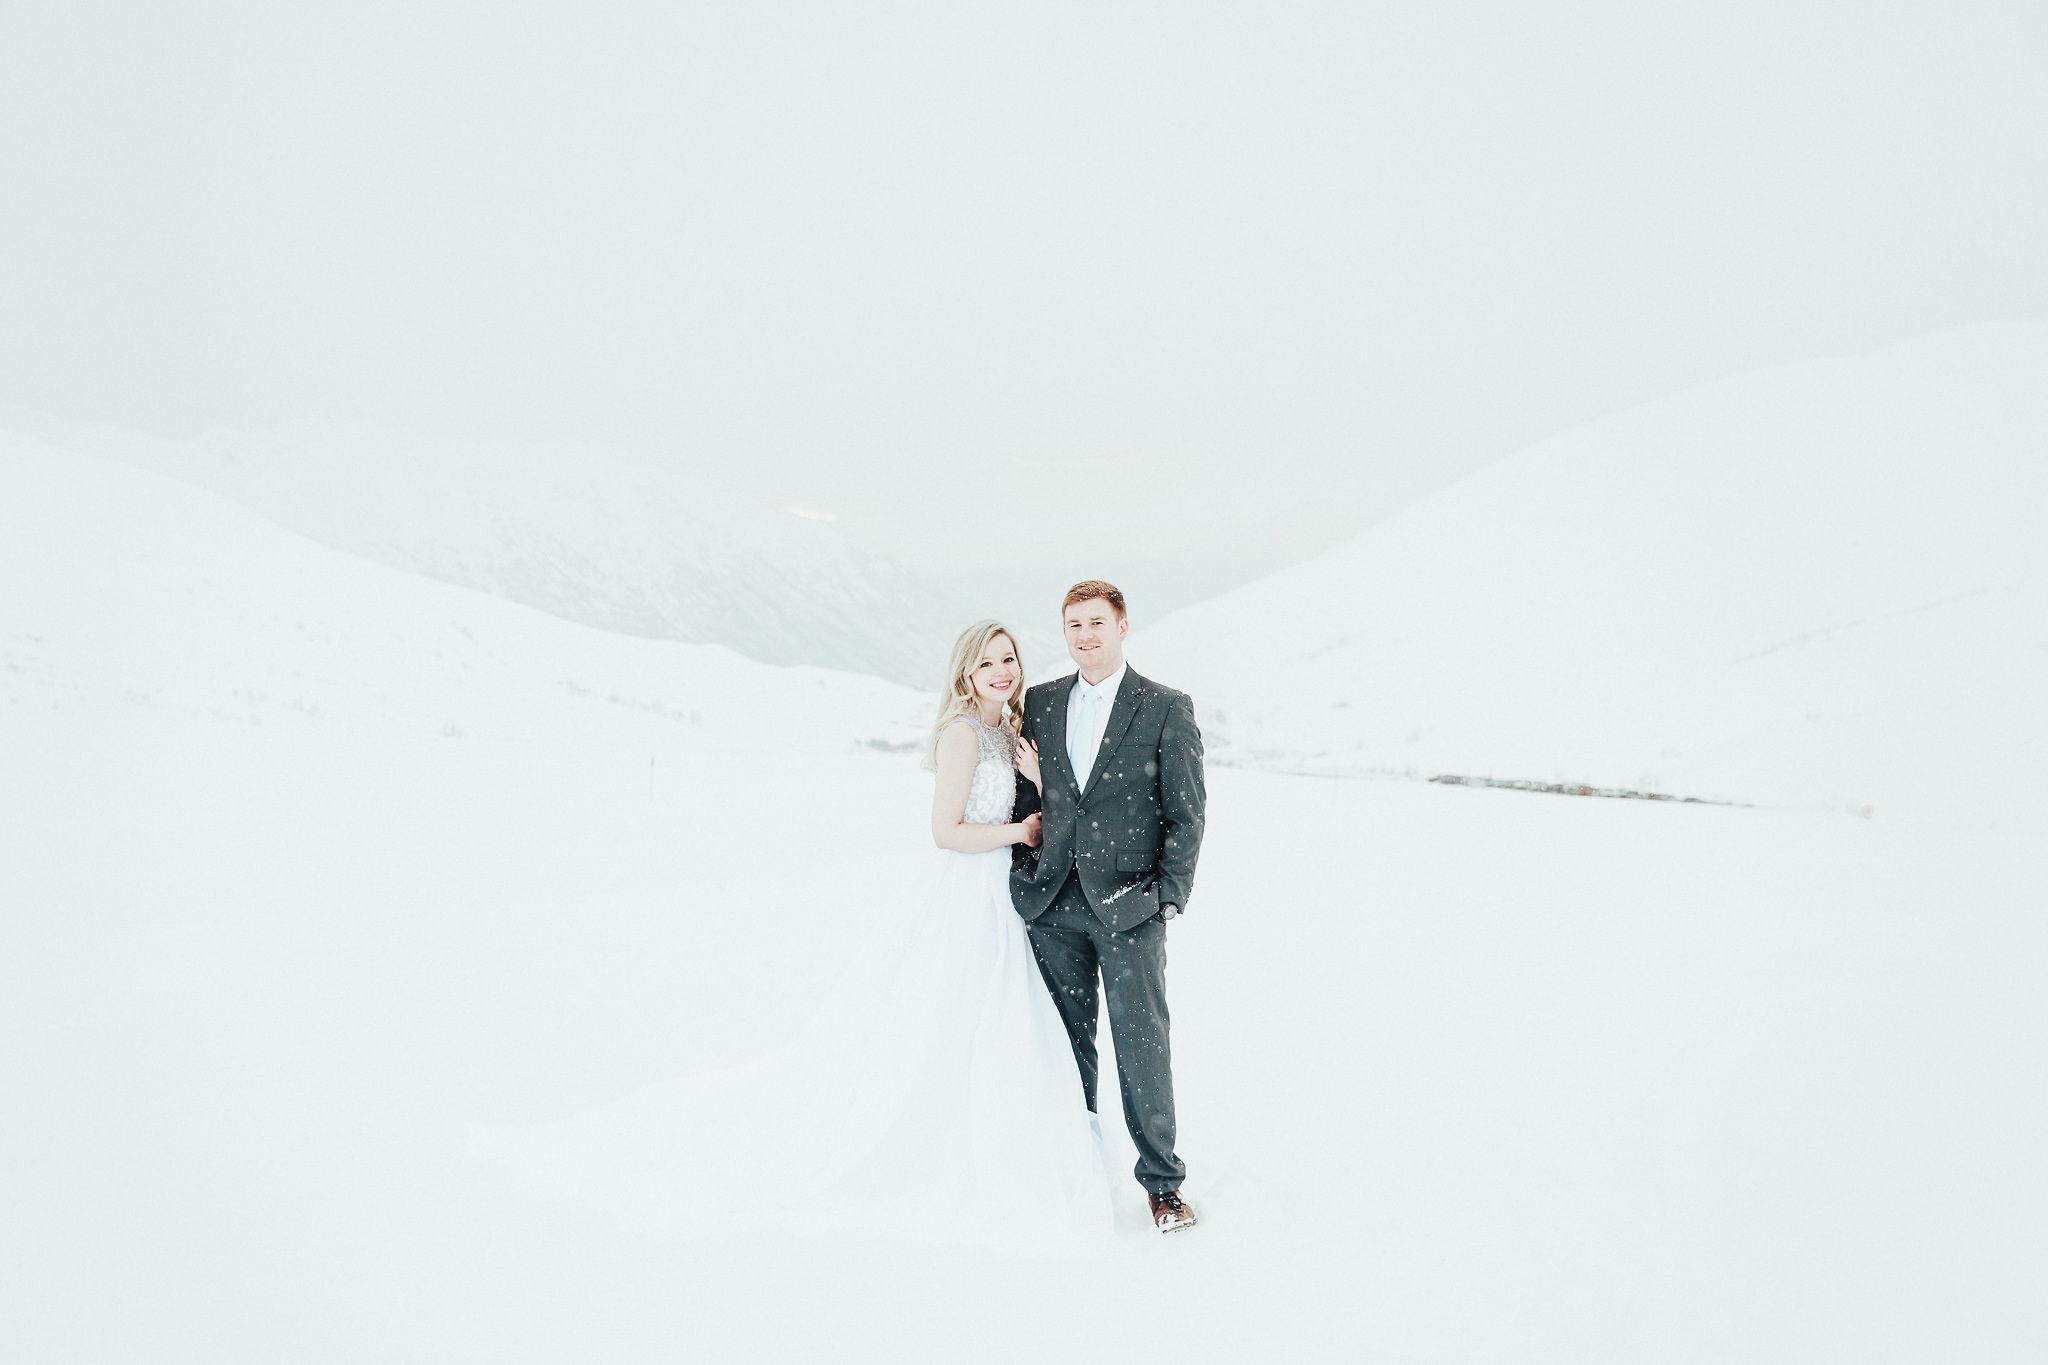 Alaska Wedding Photographer Winter Wedding